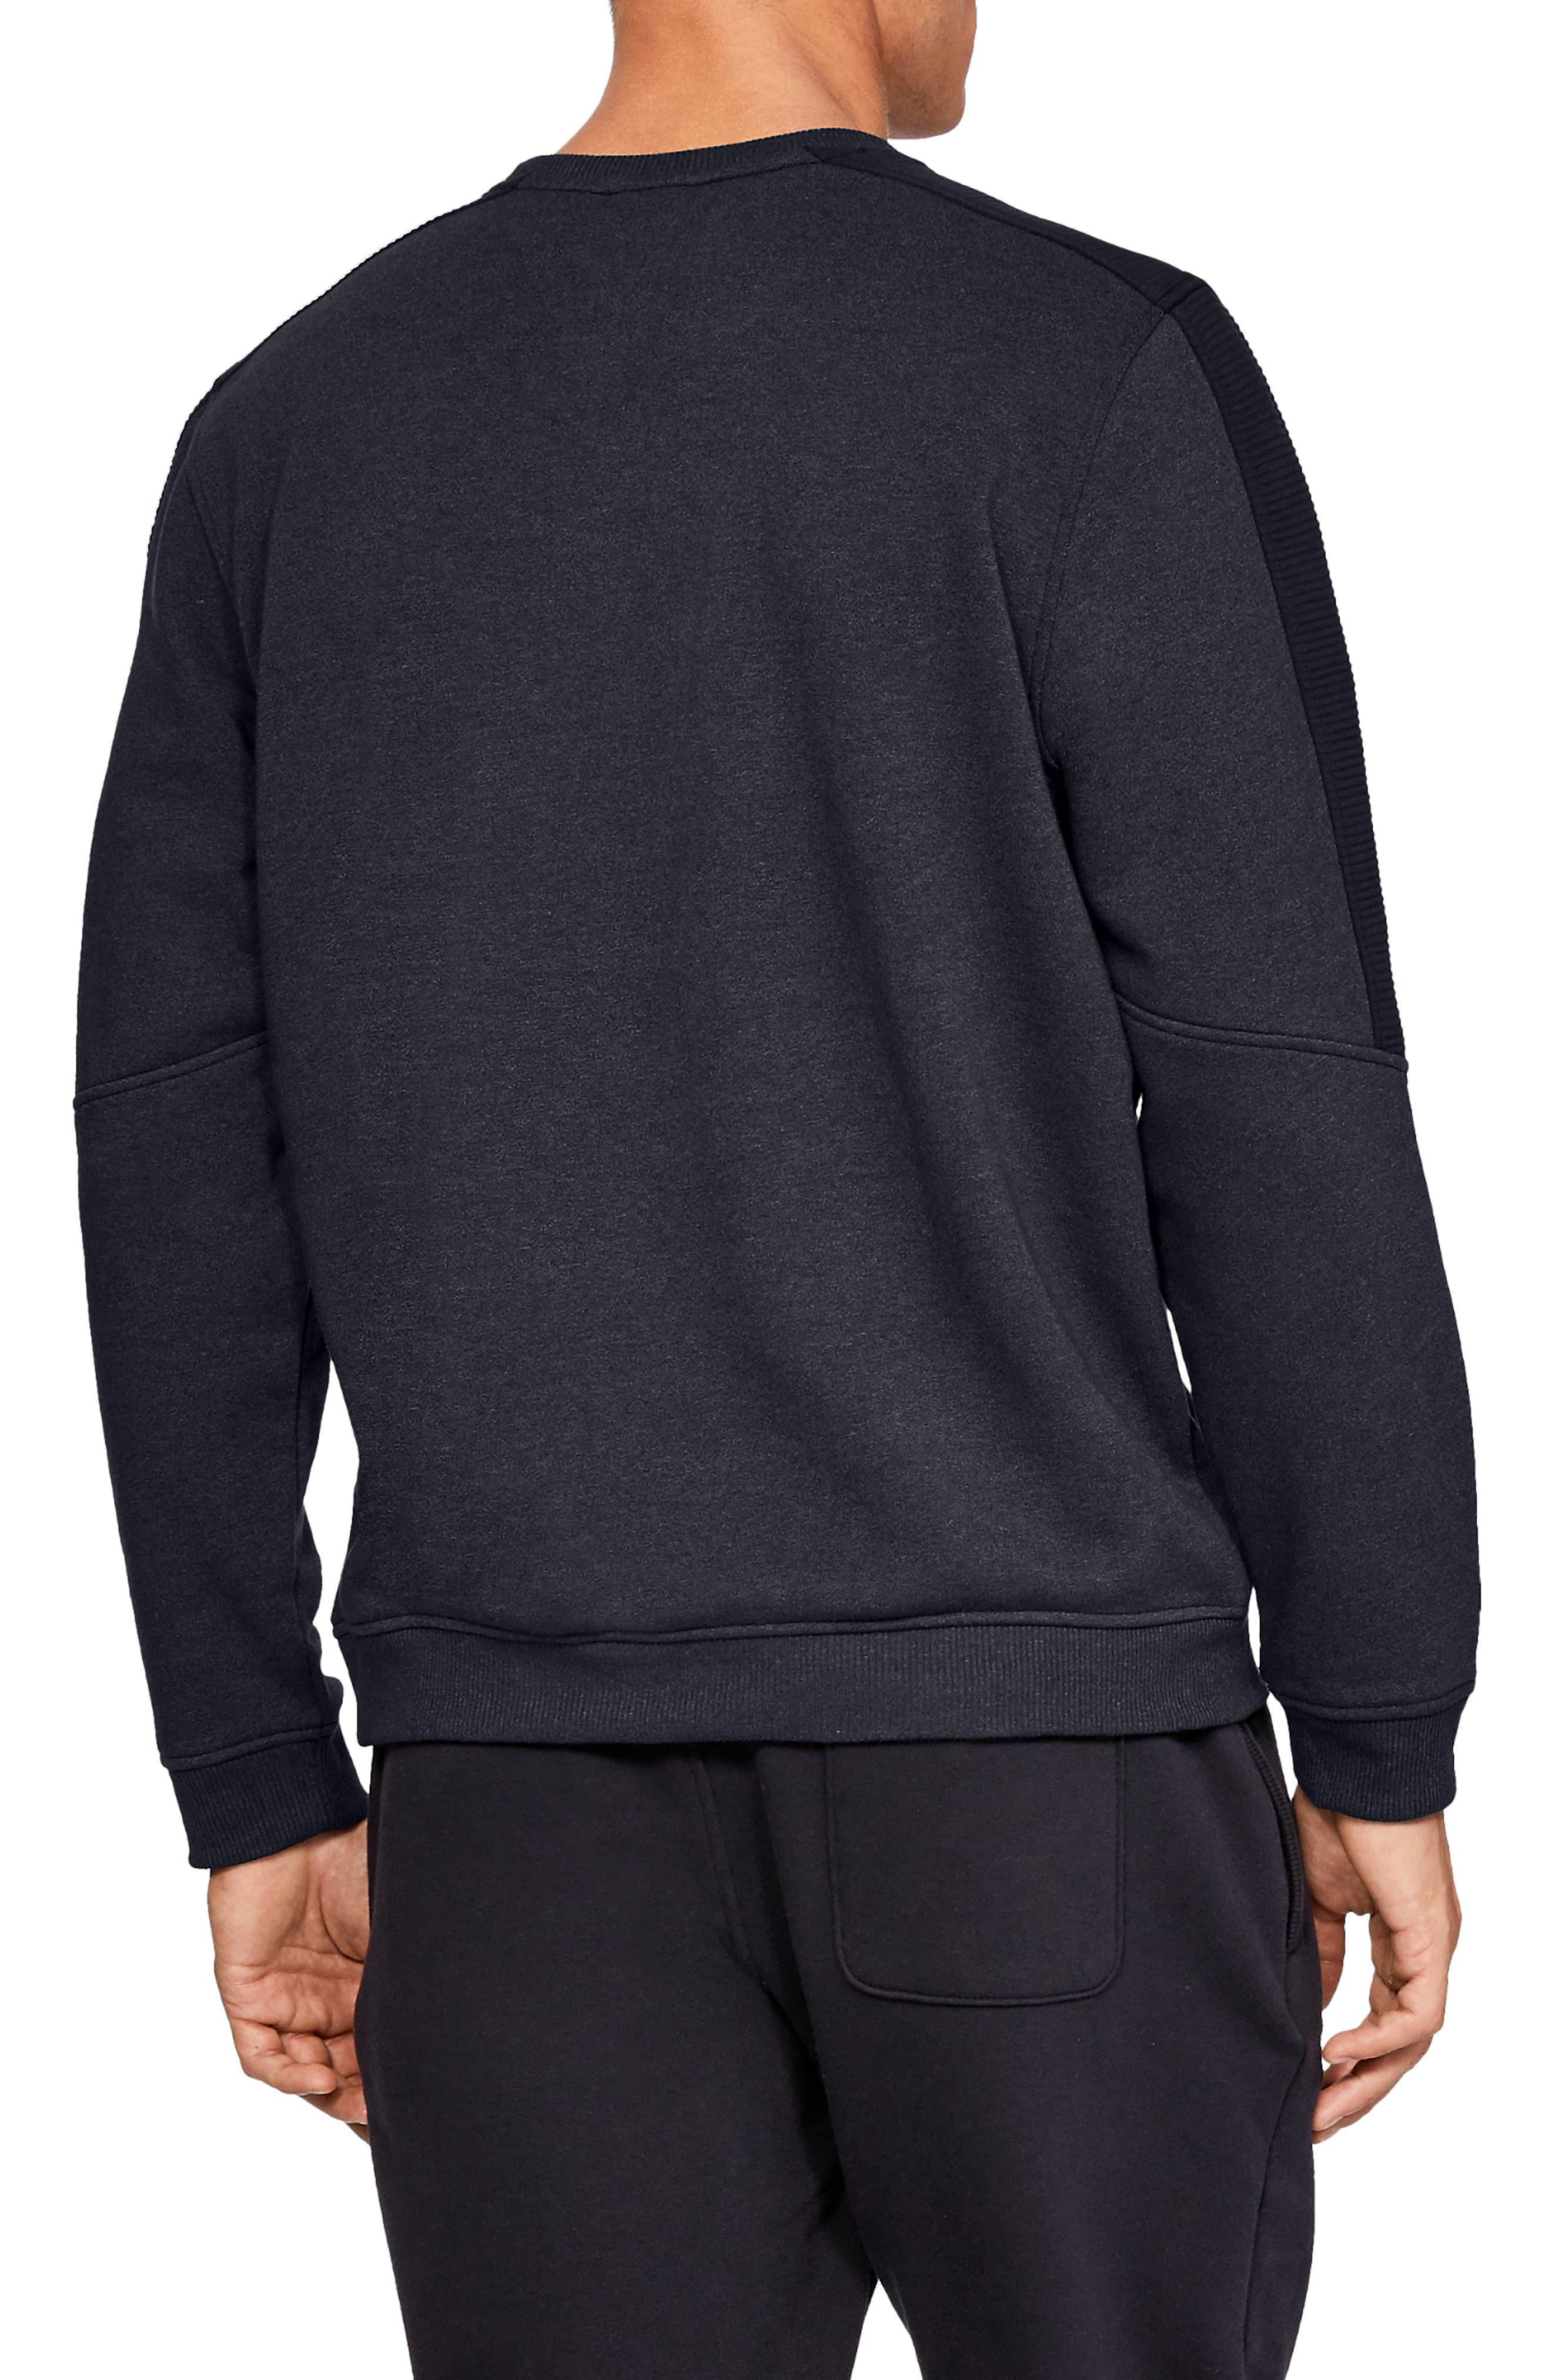 Threadborne Siro Fleece Crewneck Sweatshirt,                             Alternate thumbnail 2, color,                             BLACK/ BLACK/ BLACK